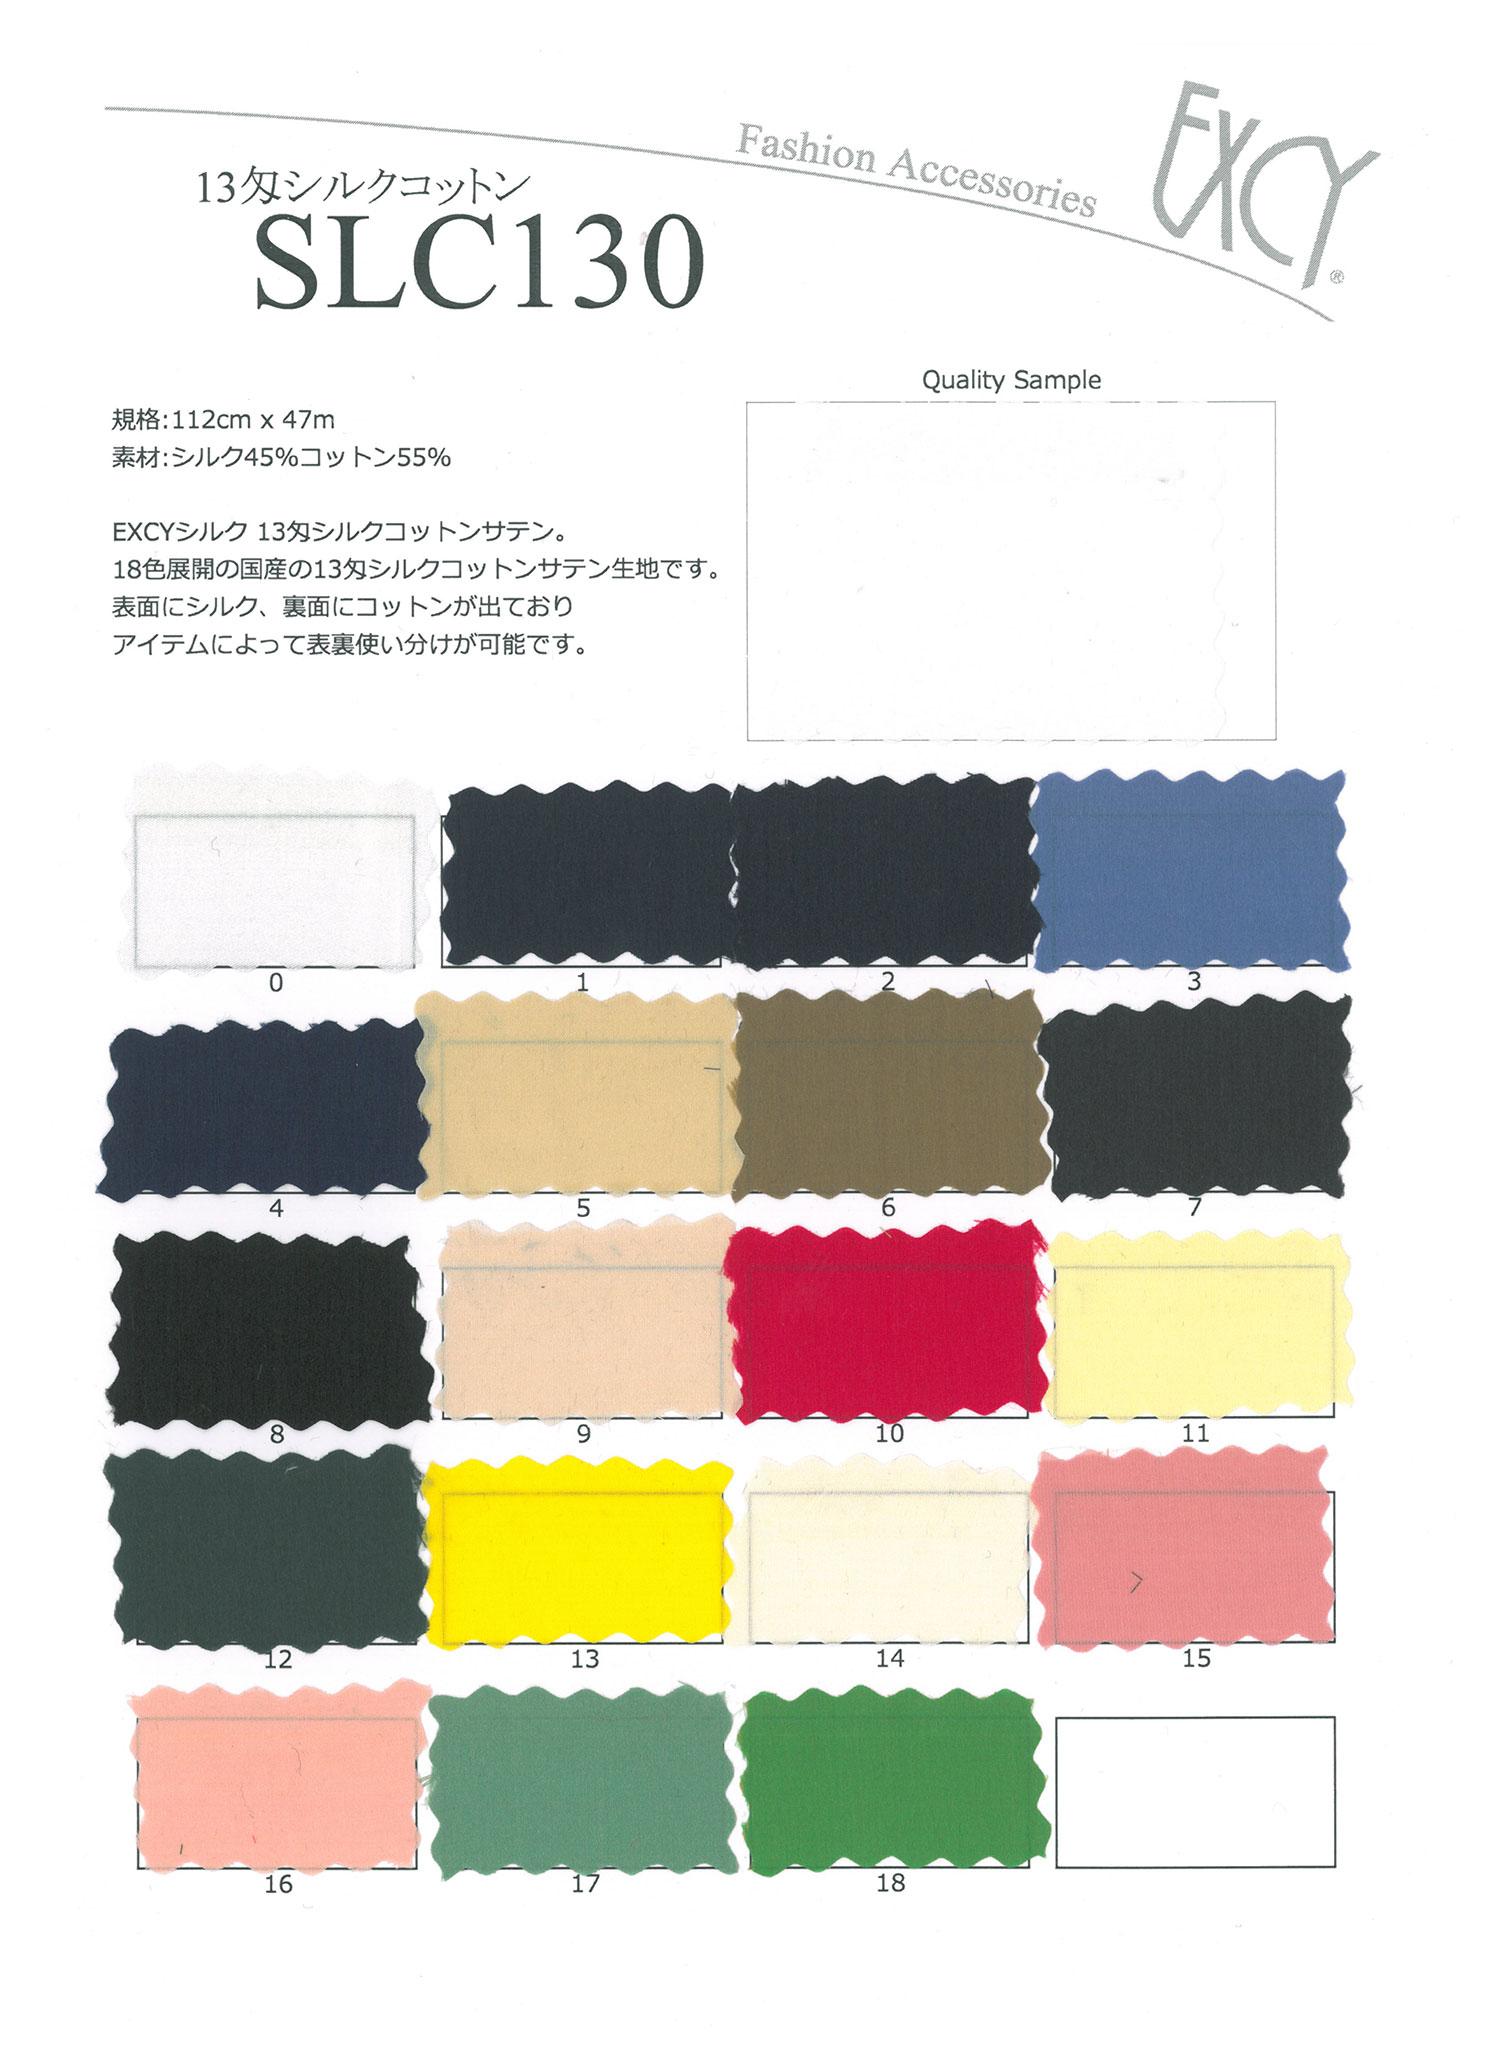 SLC130 13匁シルクコットン[生地] オークラ商事 - ApparelX アパレル資材卸通販